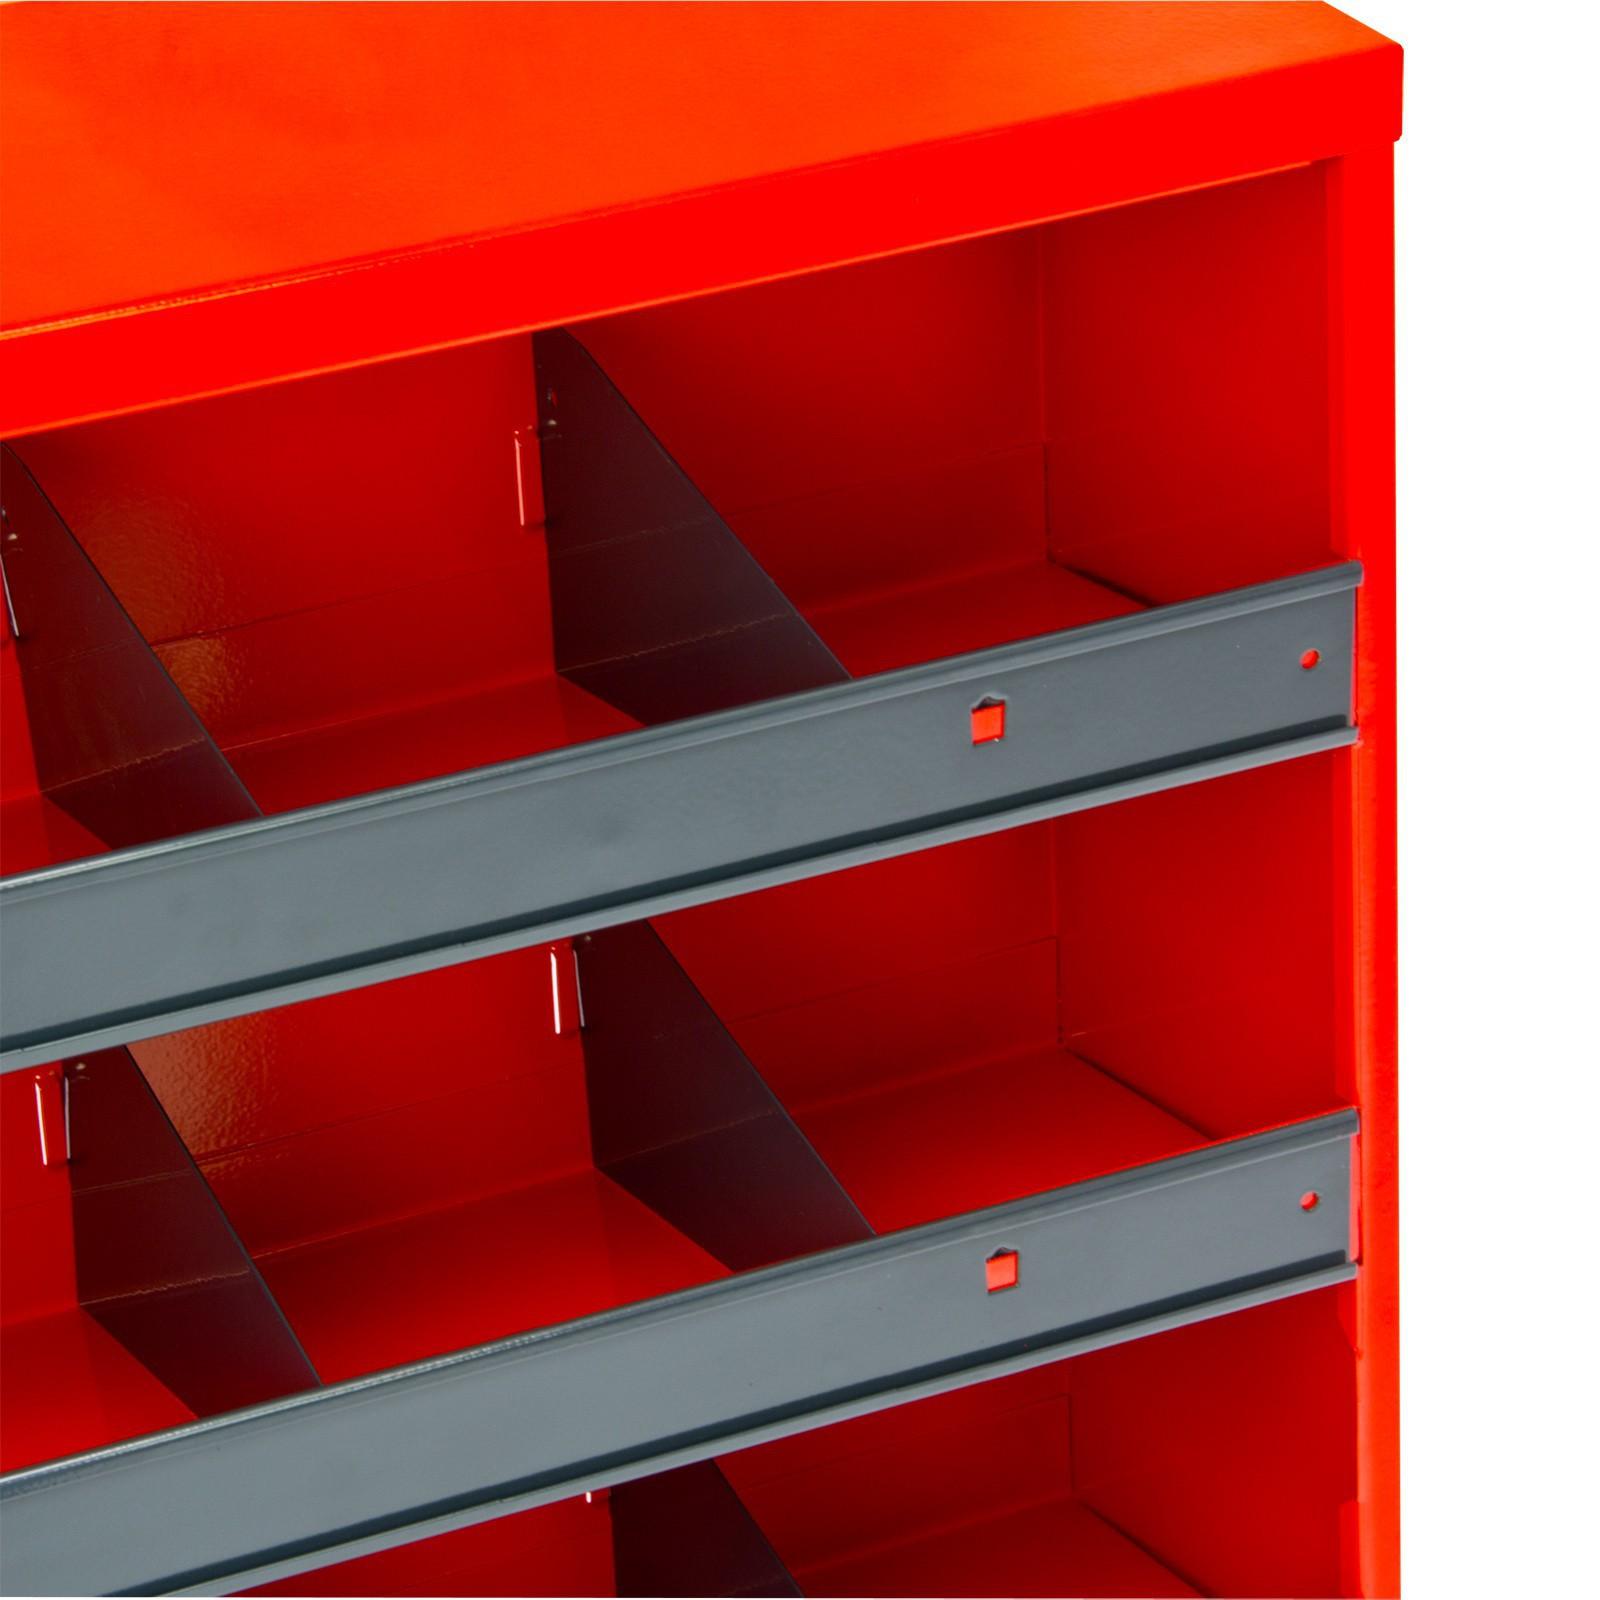 adb kleinteile regal h700xb500xt167 mm 20 f cher rot ral 3020 inkl glast r. Black Bedroom Furniture Sets. Home Design Ideas